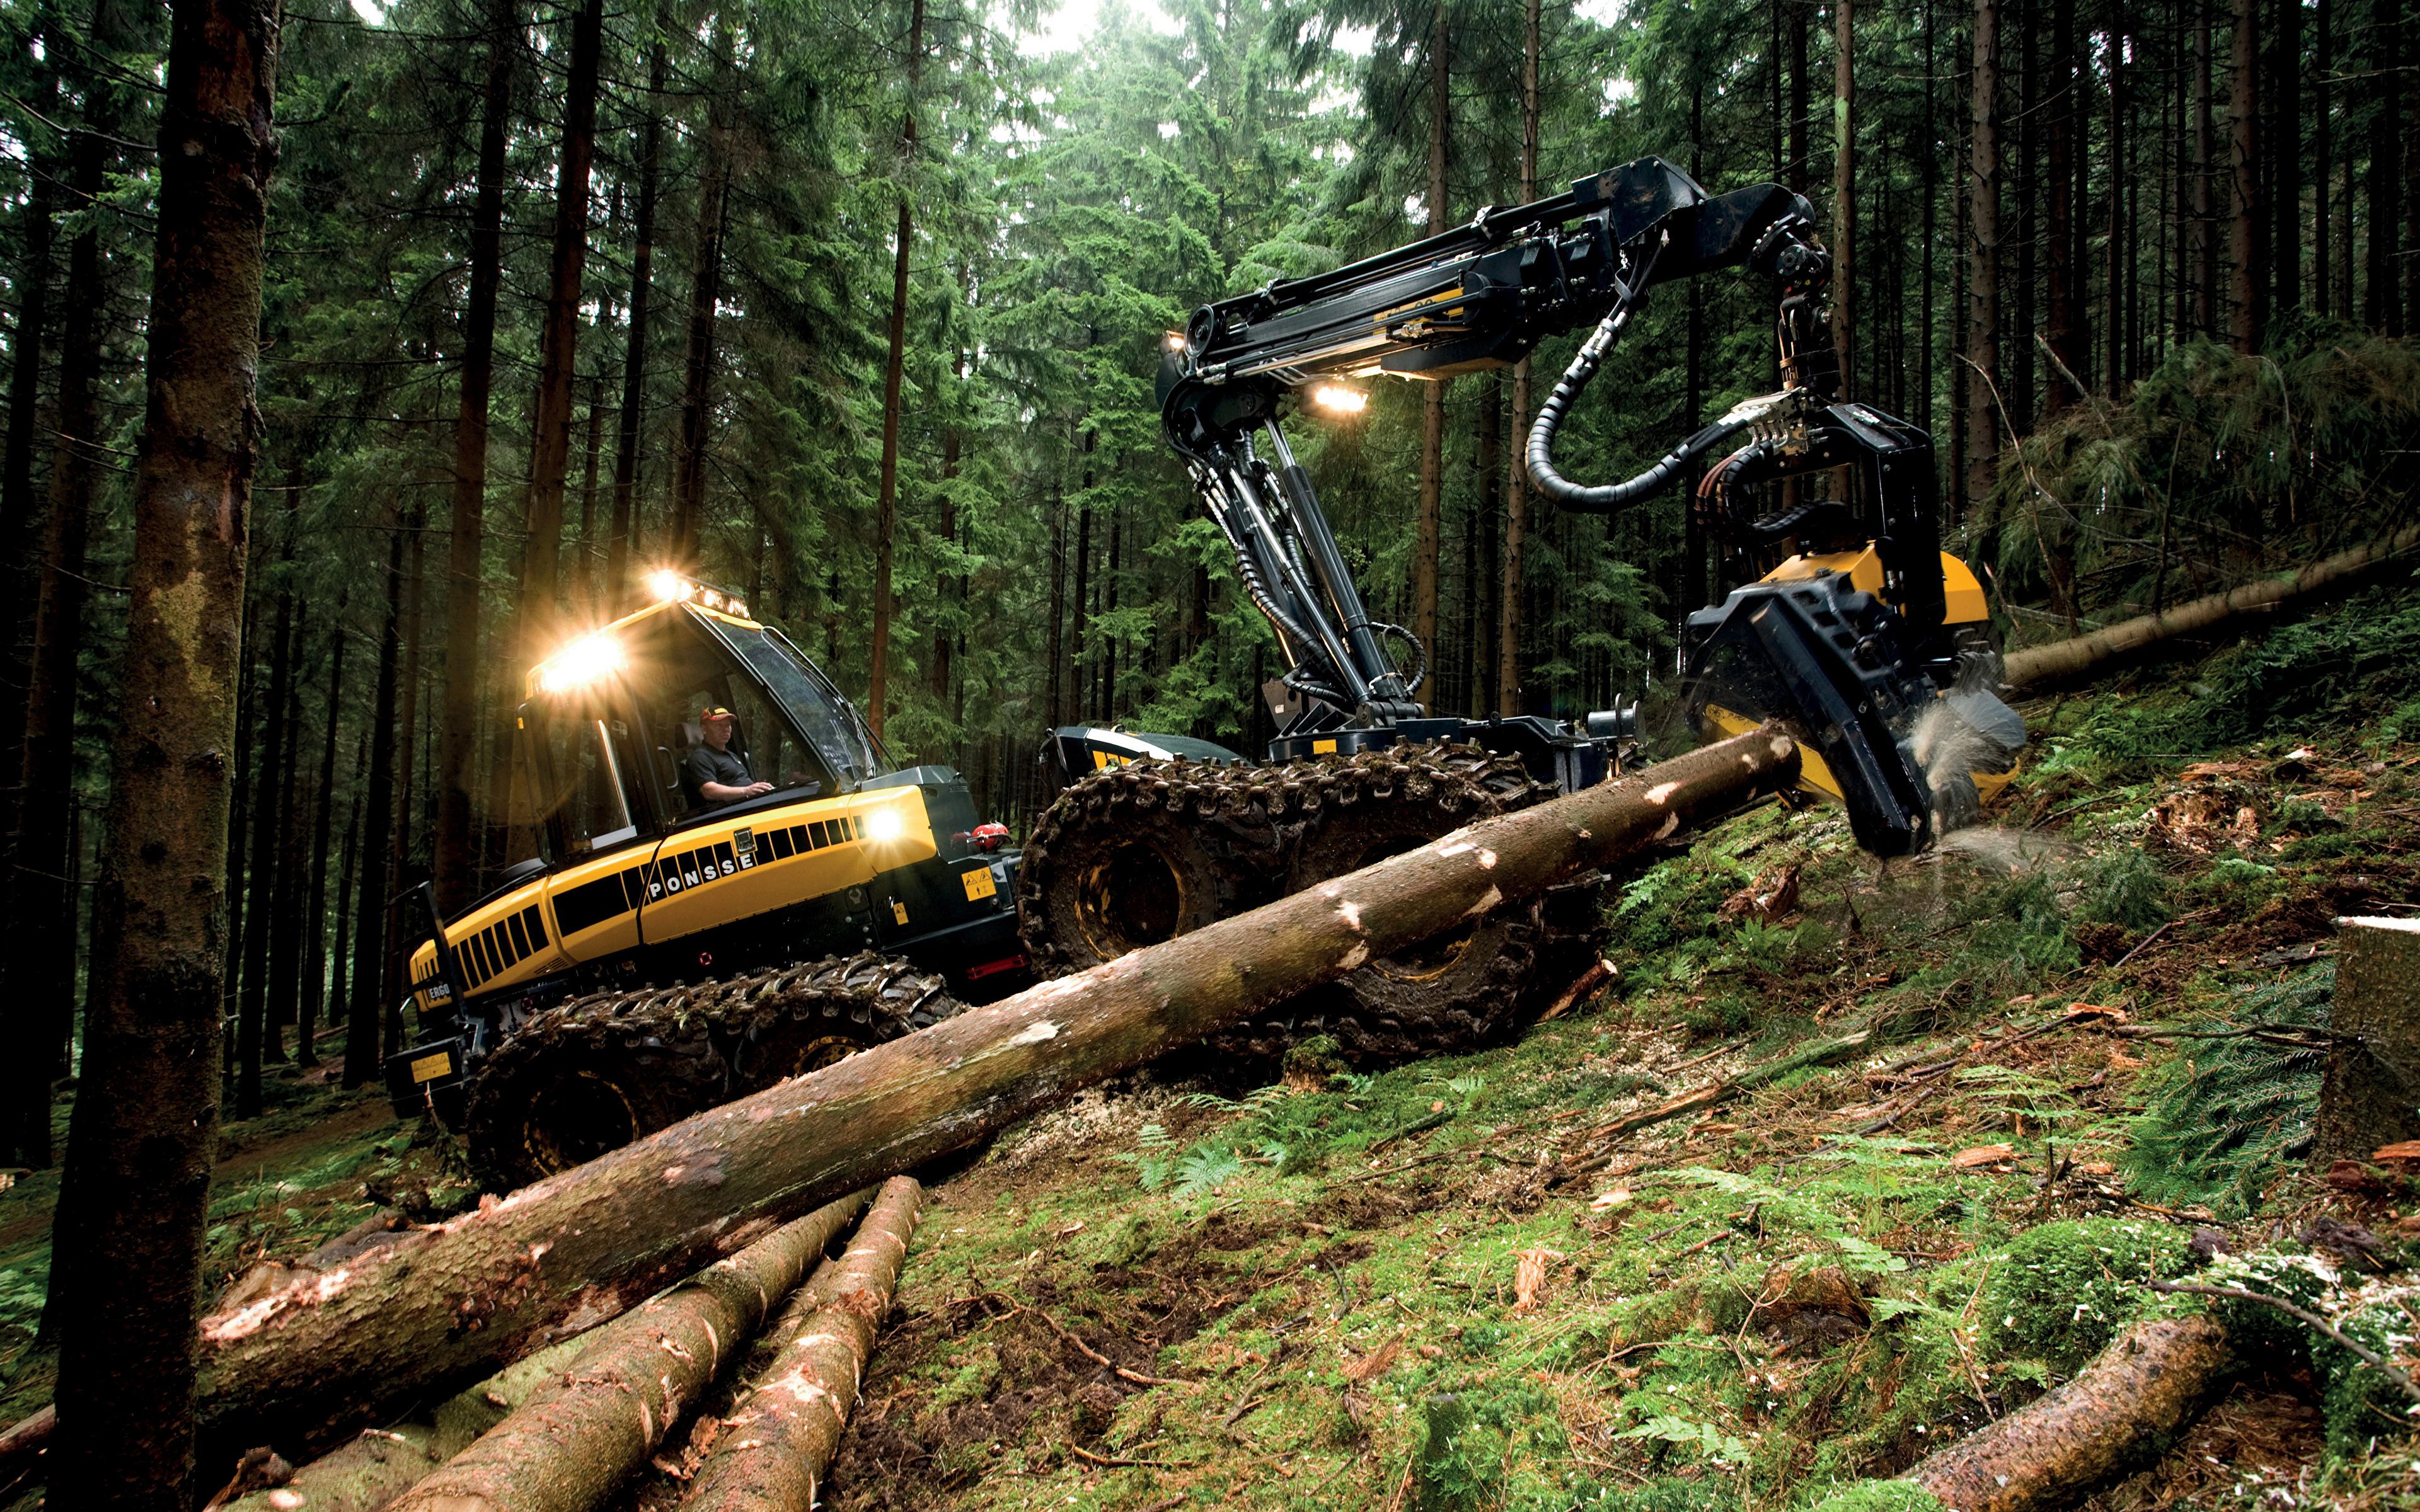 Картинки Форвардер 2010-14 Ponsse Ergo 8w бревно лес 3840x2400 Бревна Леса